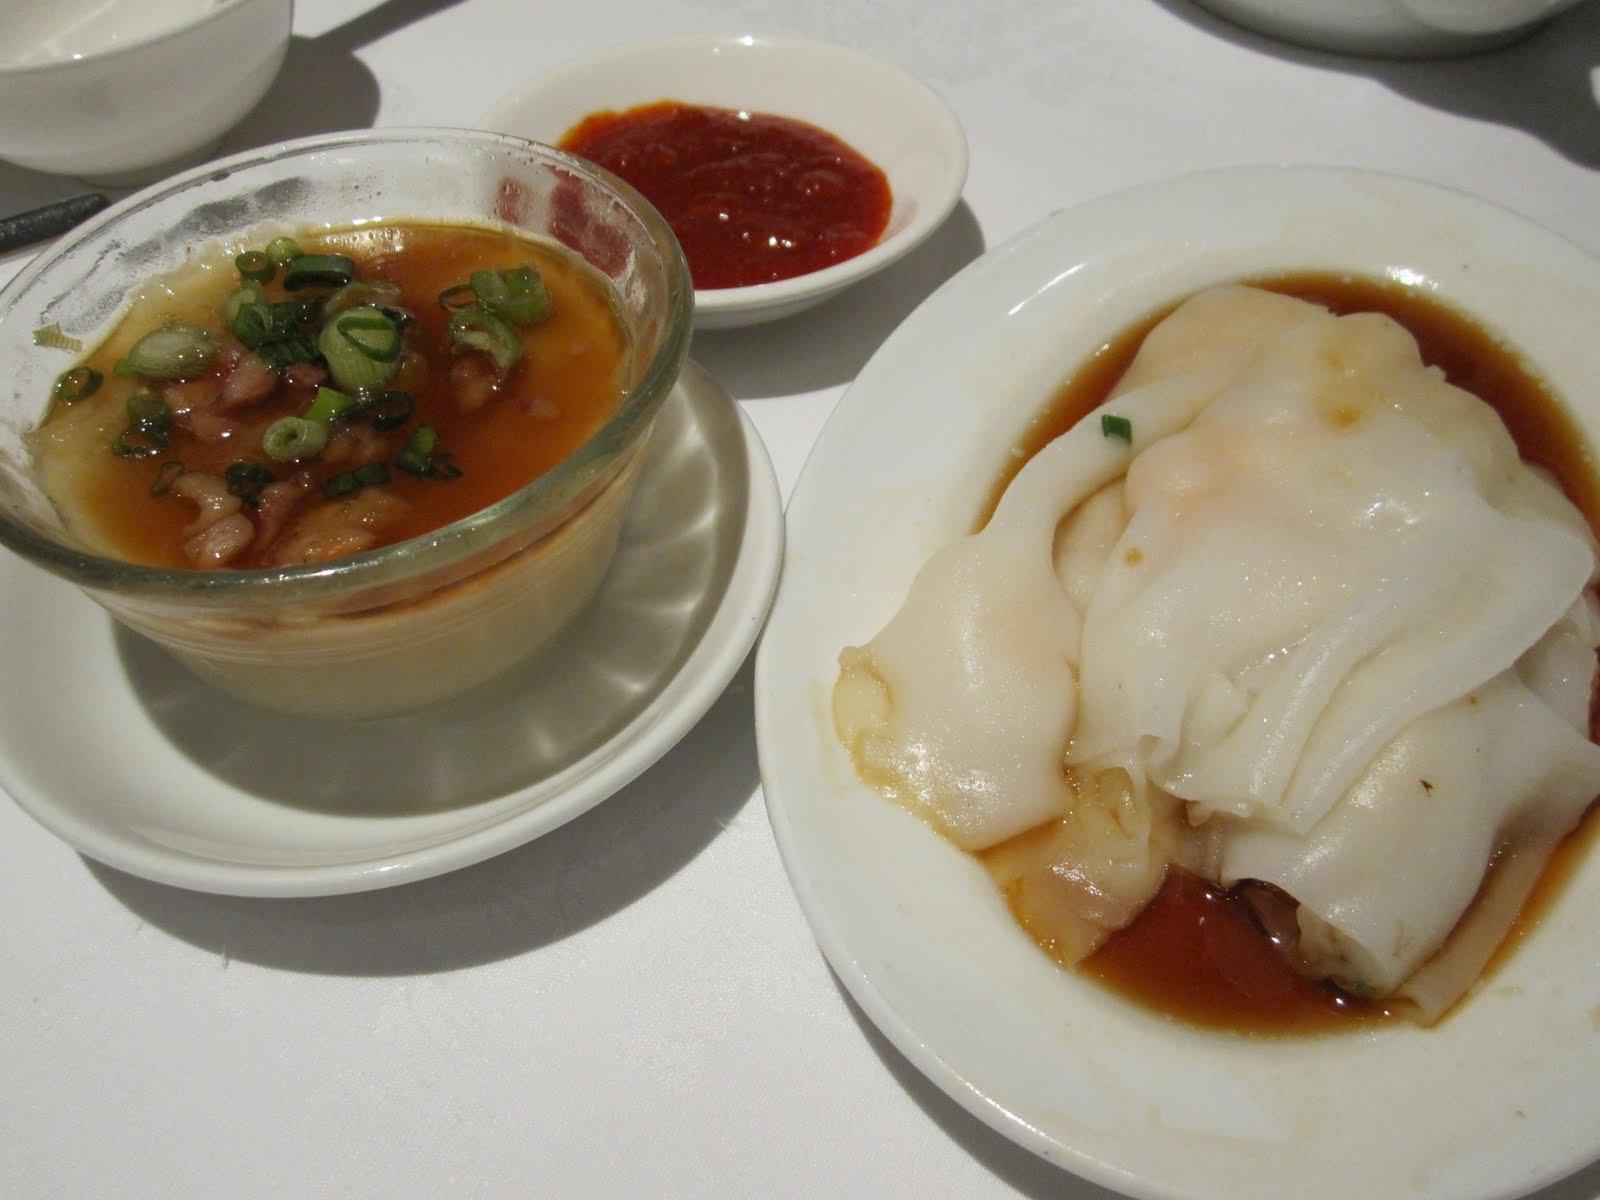 Lok wah fashion group LOK WAH HIN CHINESE RESTAURANT BANGKOK - Restaurants